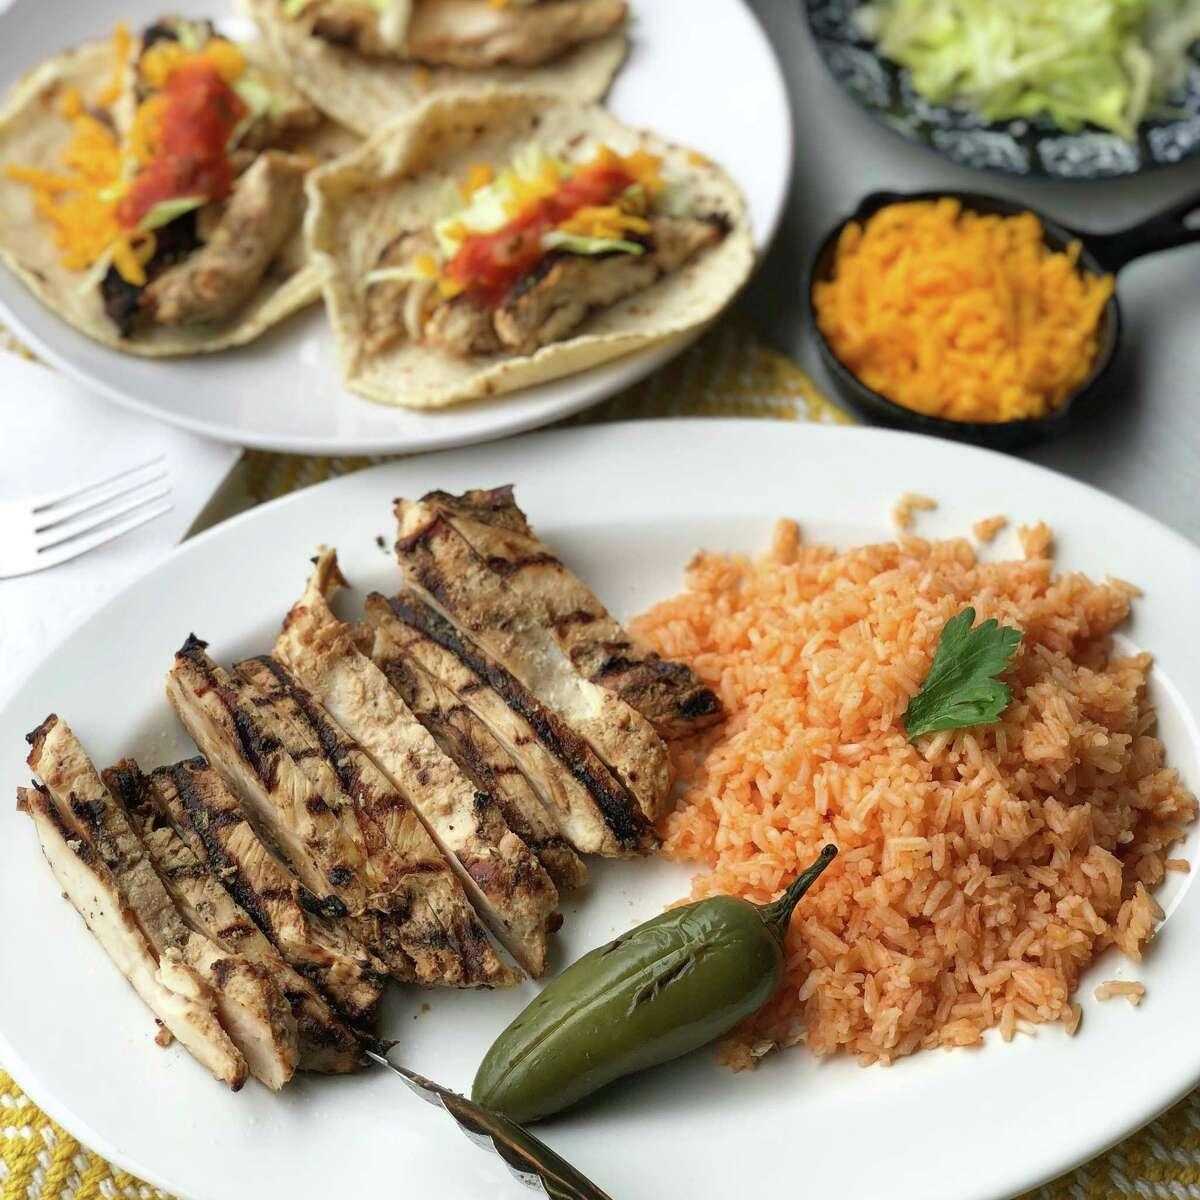 Fajita Pete's fajita delivery restaurant is expanding.